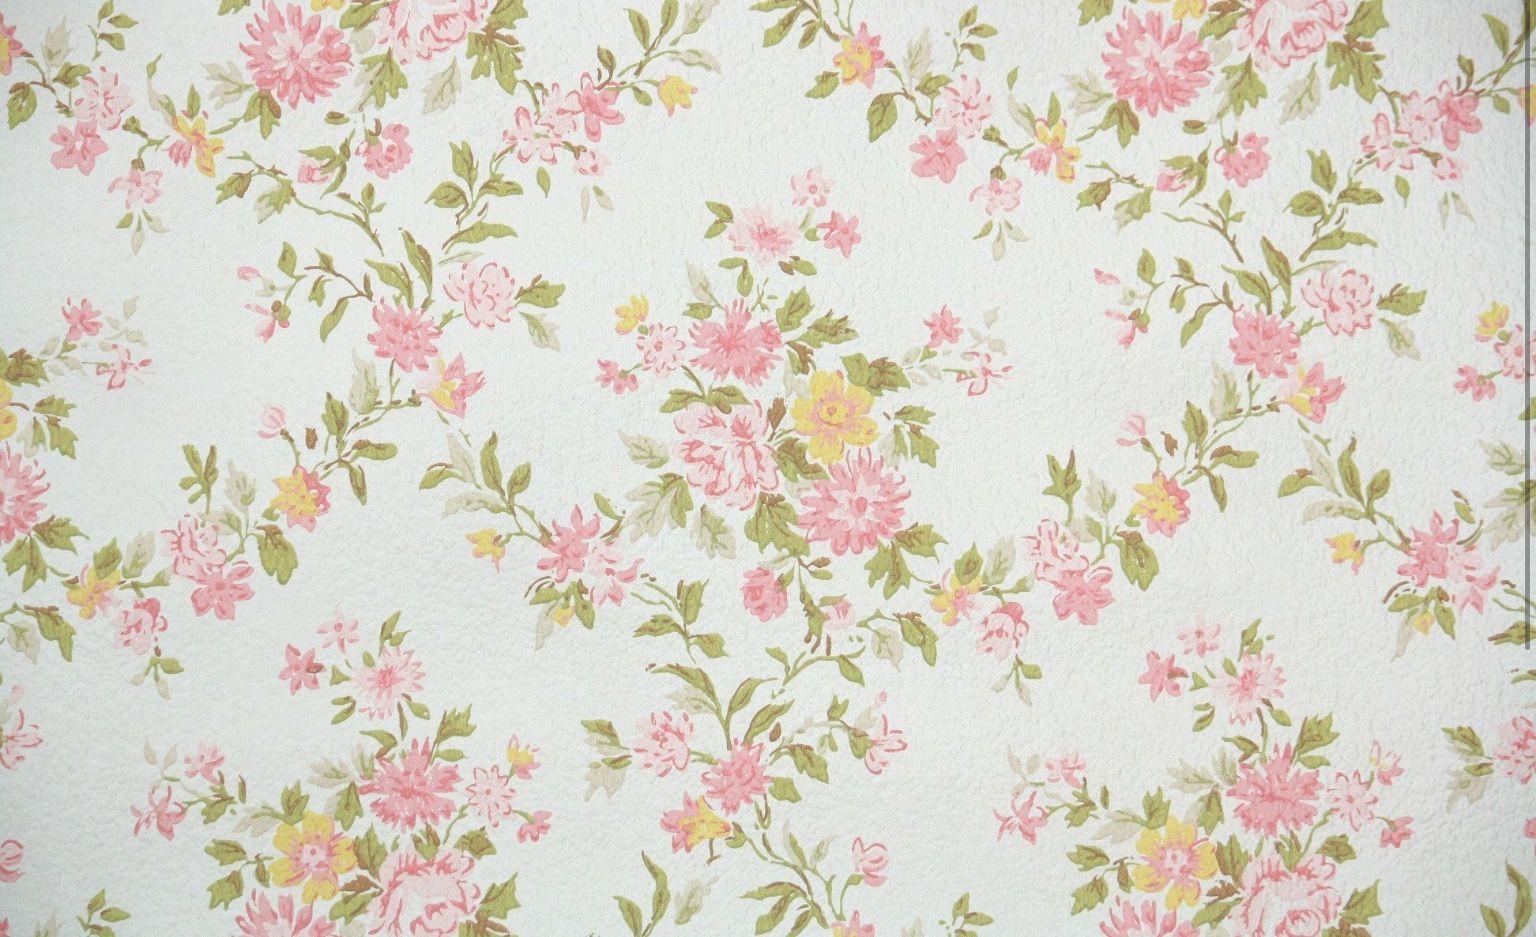 Love It Vintage Floral Wallpapers Wallpapers Vintage Vintage